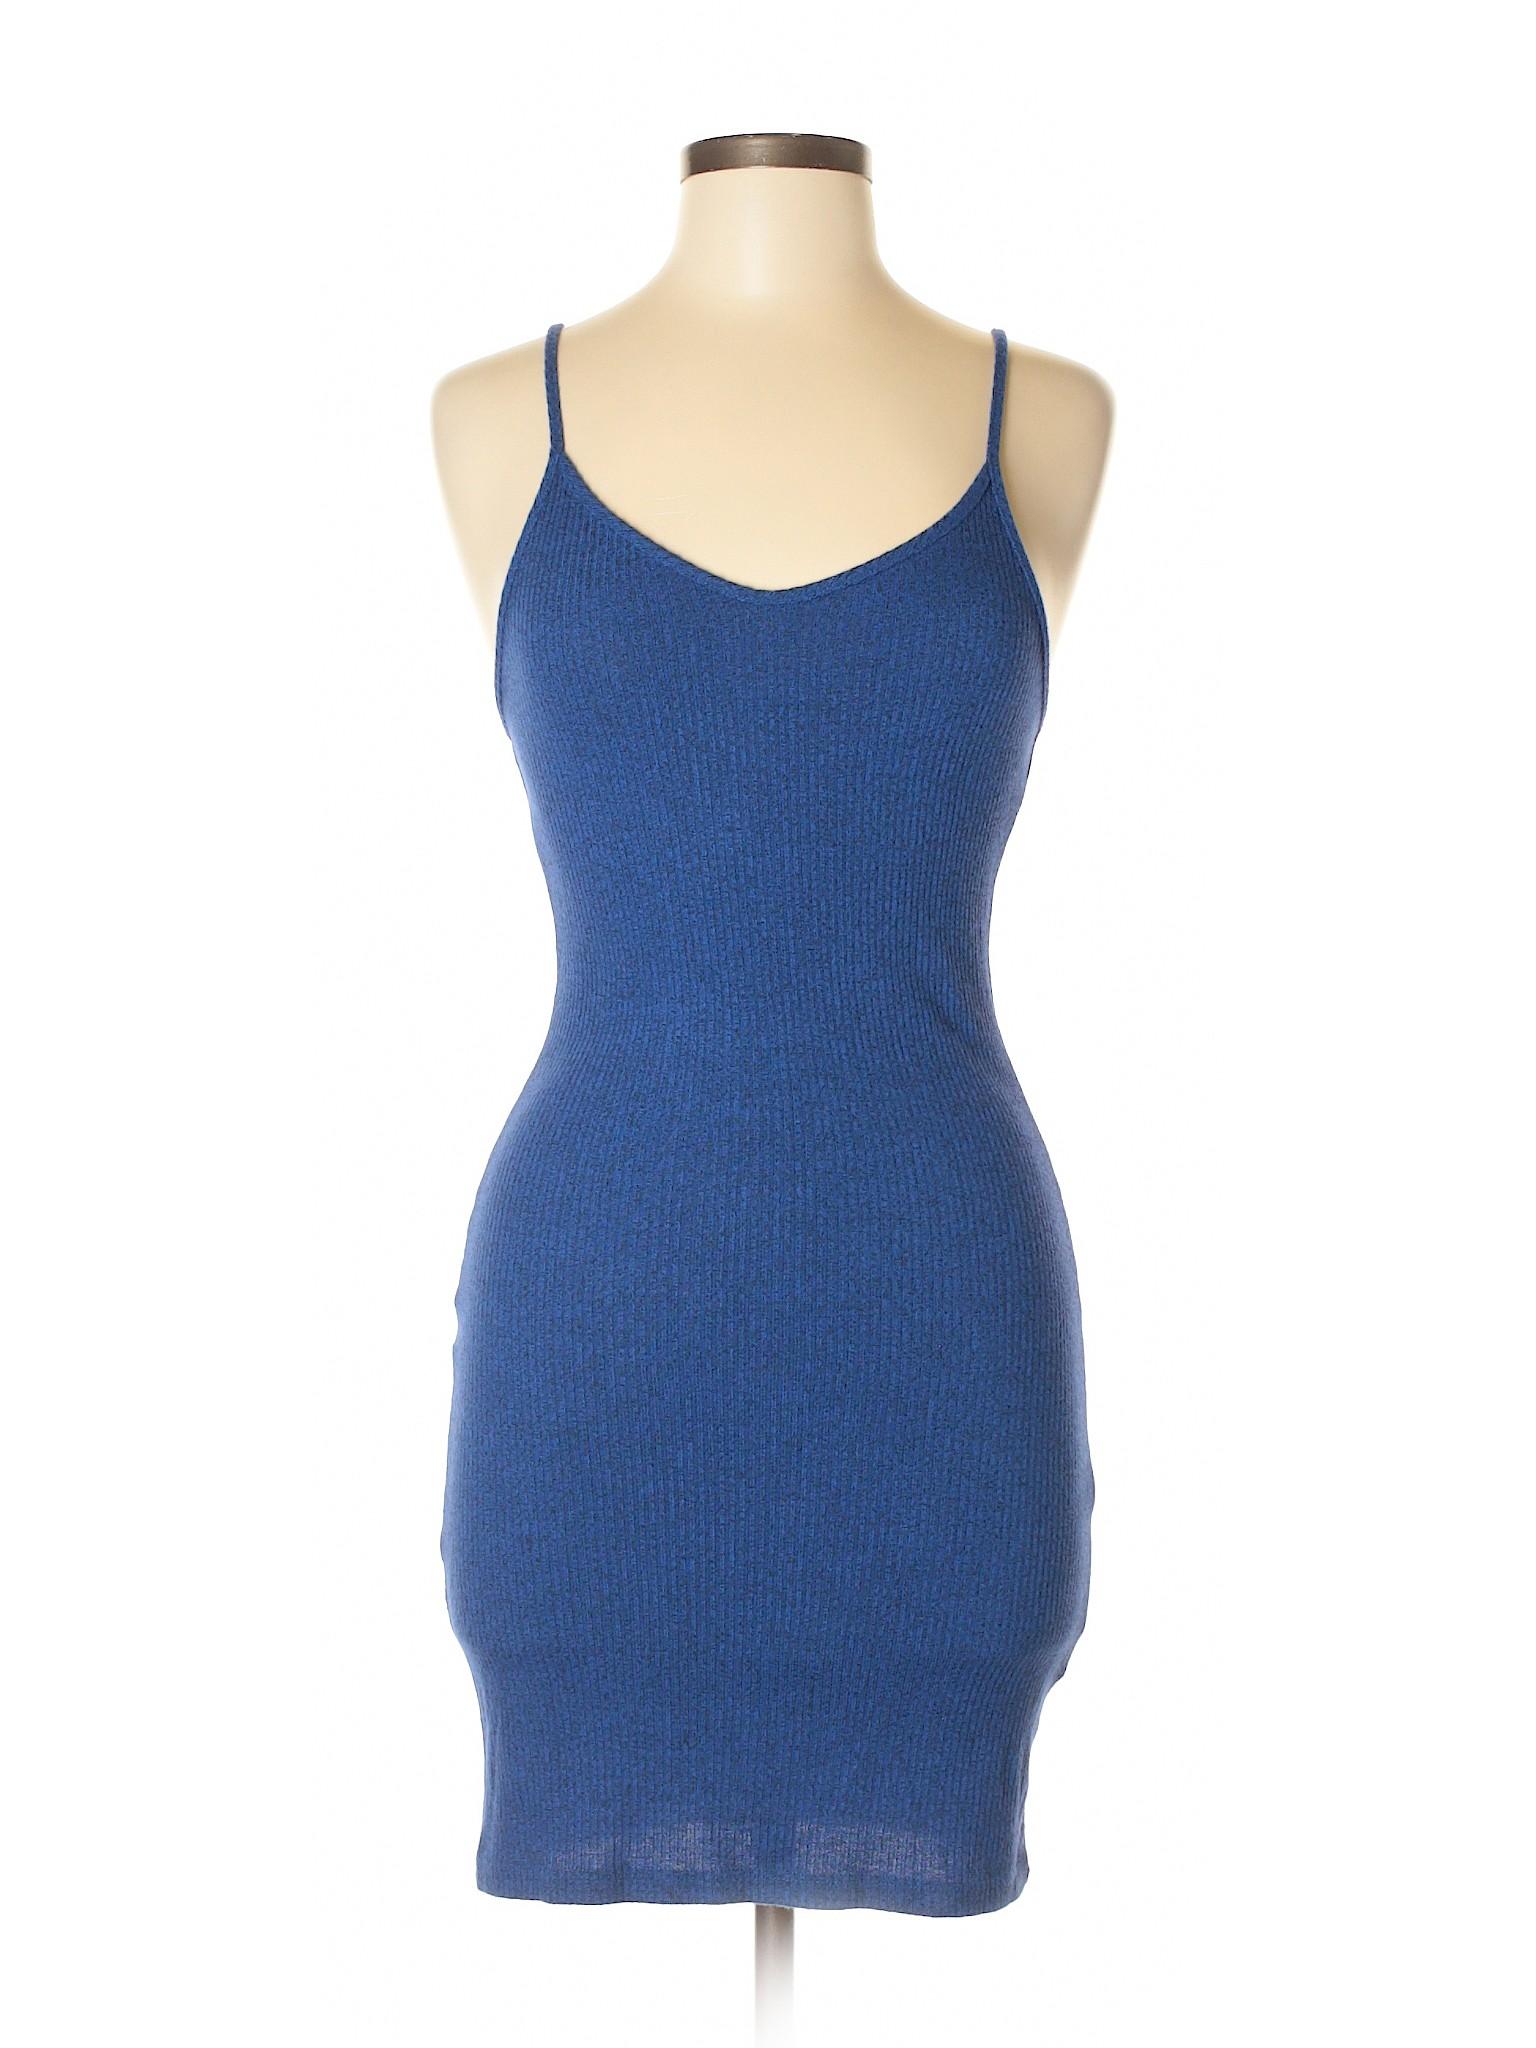 Casual Selling Topshop Topshop Selling Dress TtwxFdqw